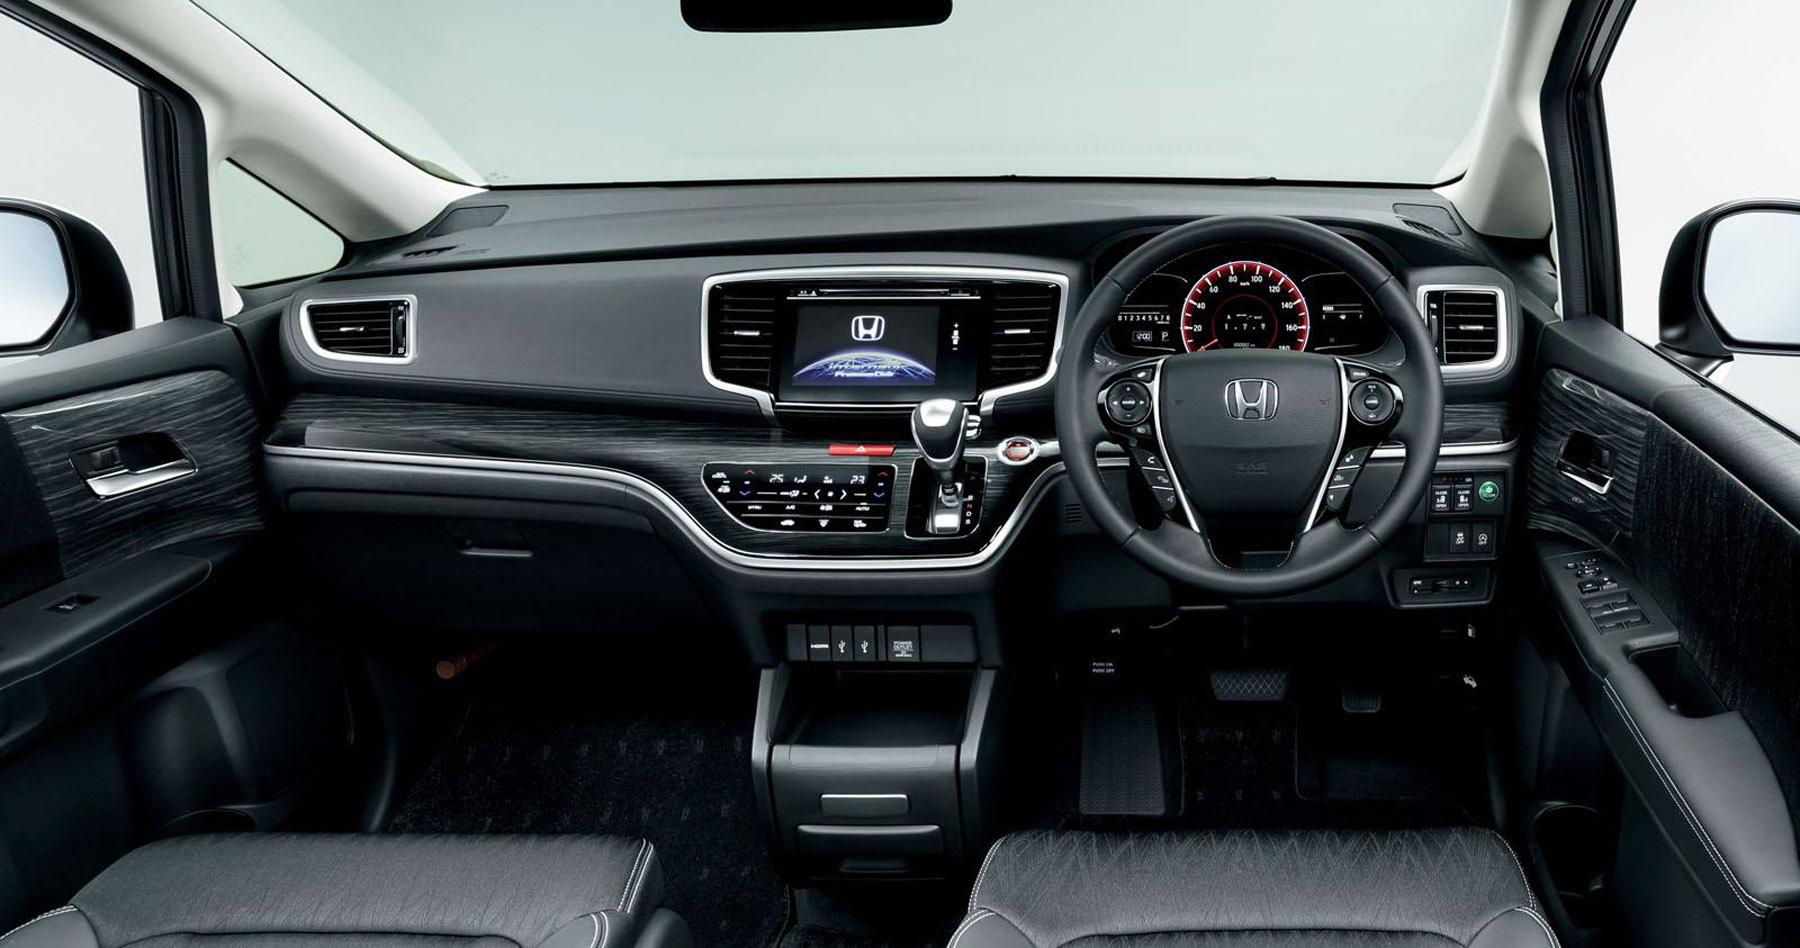 2014 Honda Odyssey Jdm Picture 90795